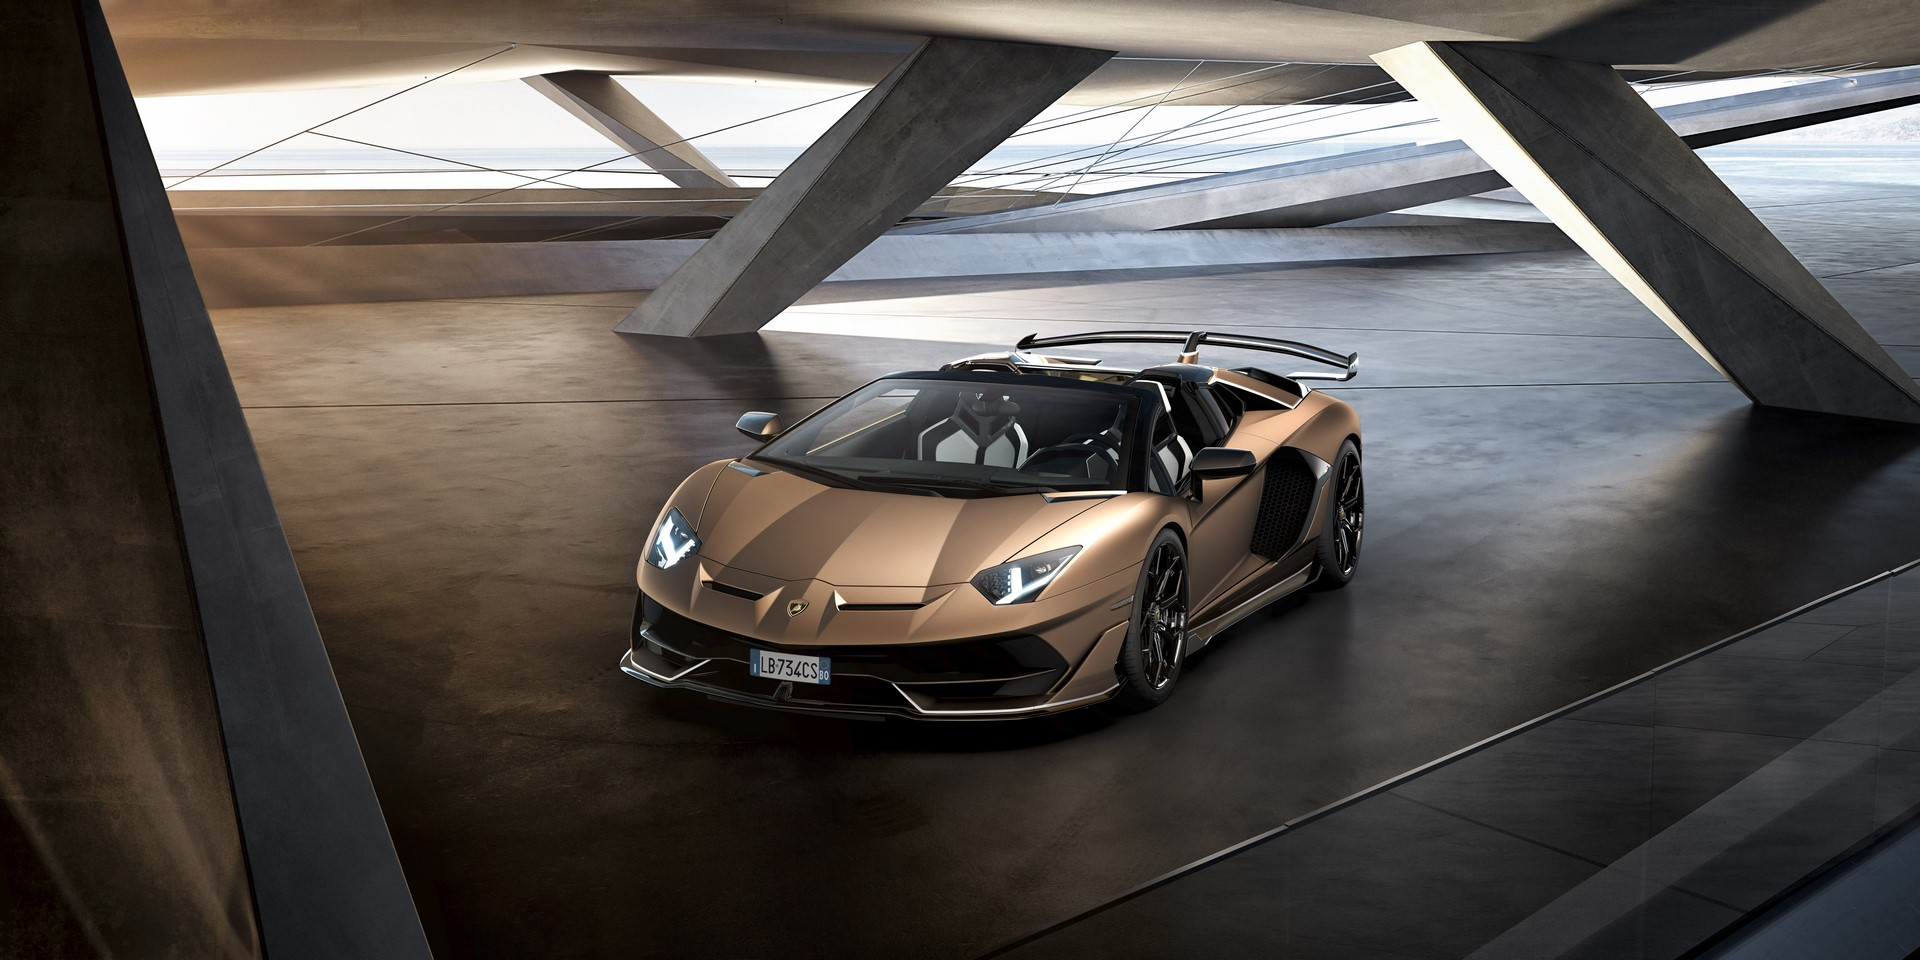 Lamborghini Aventador SVJ Roadster (14)